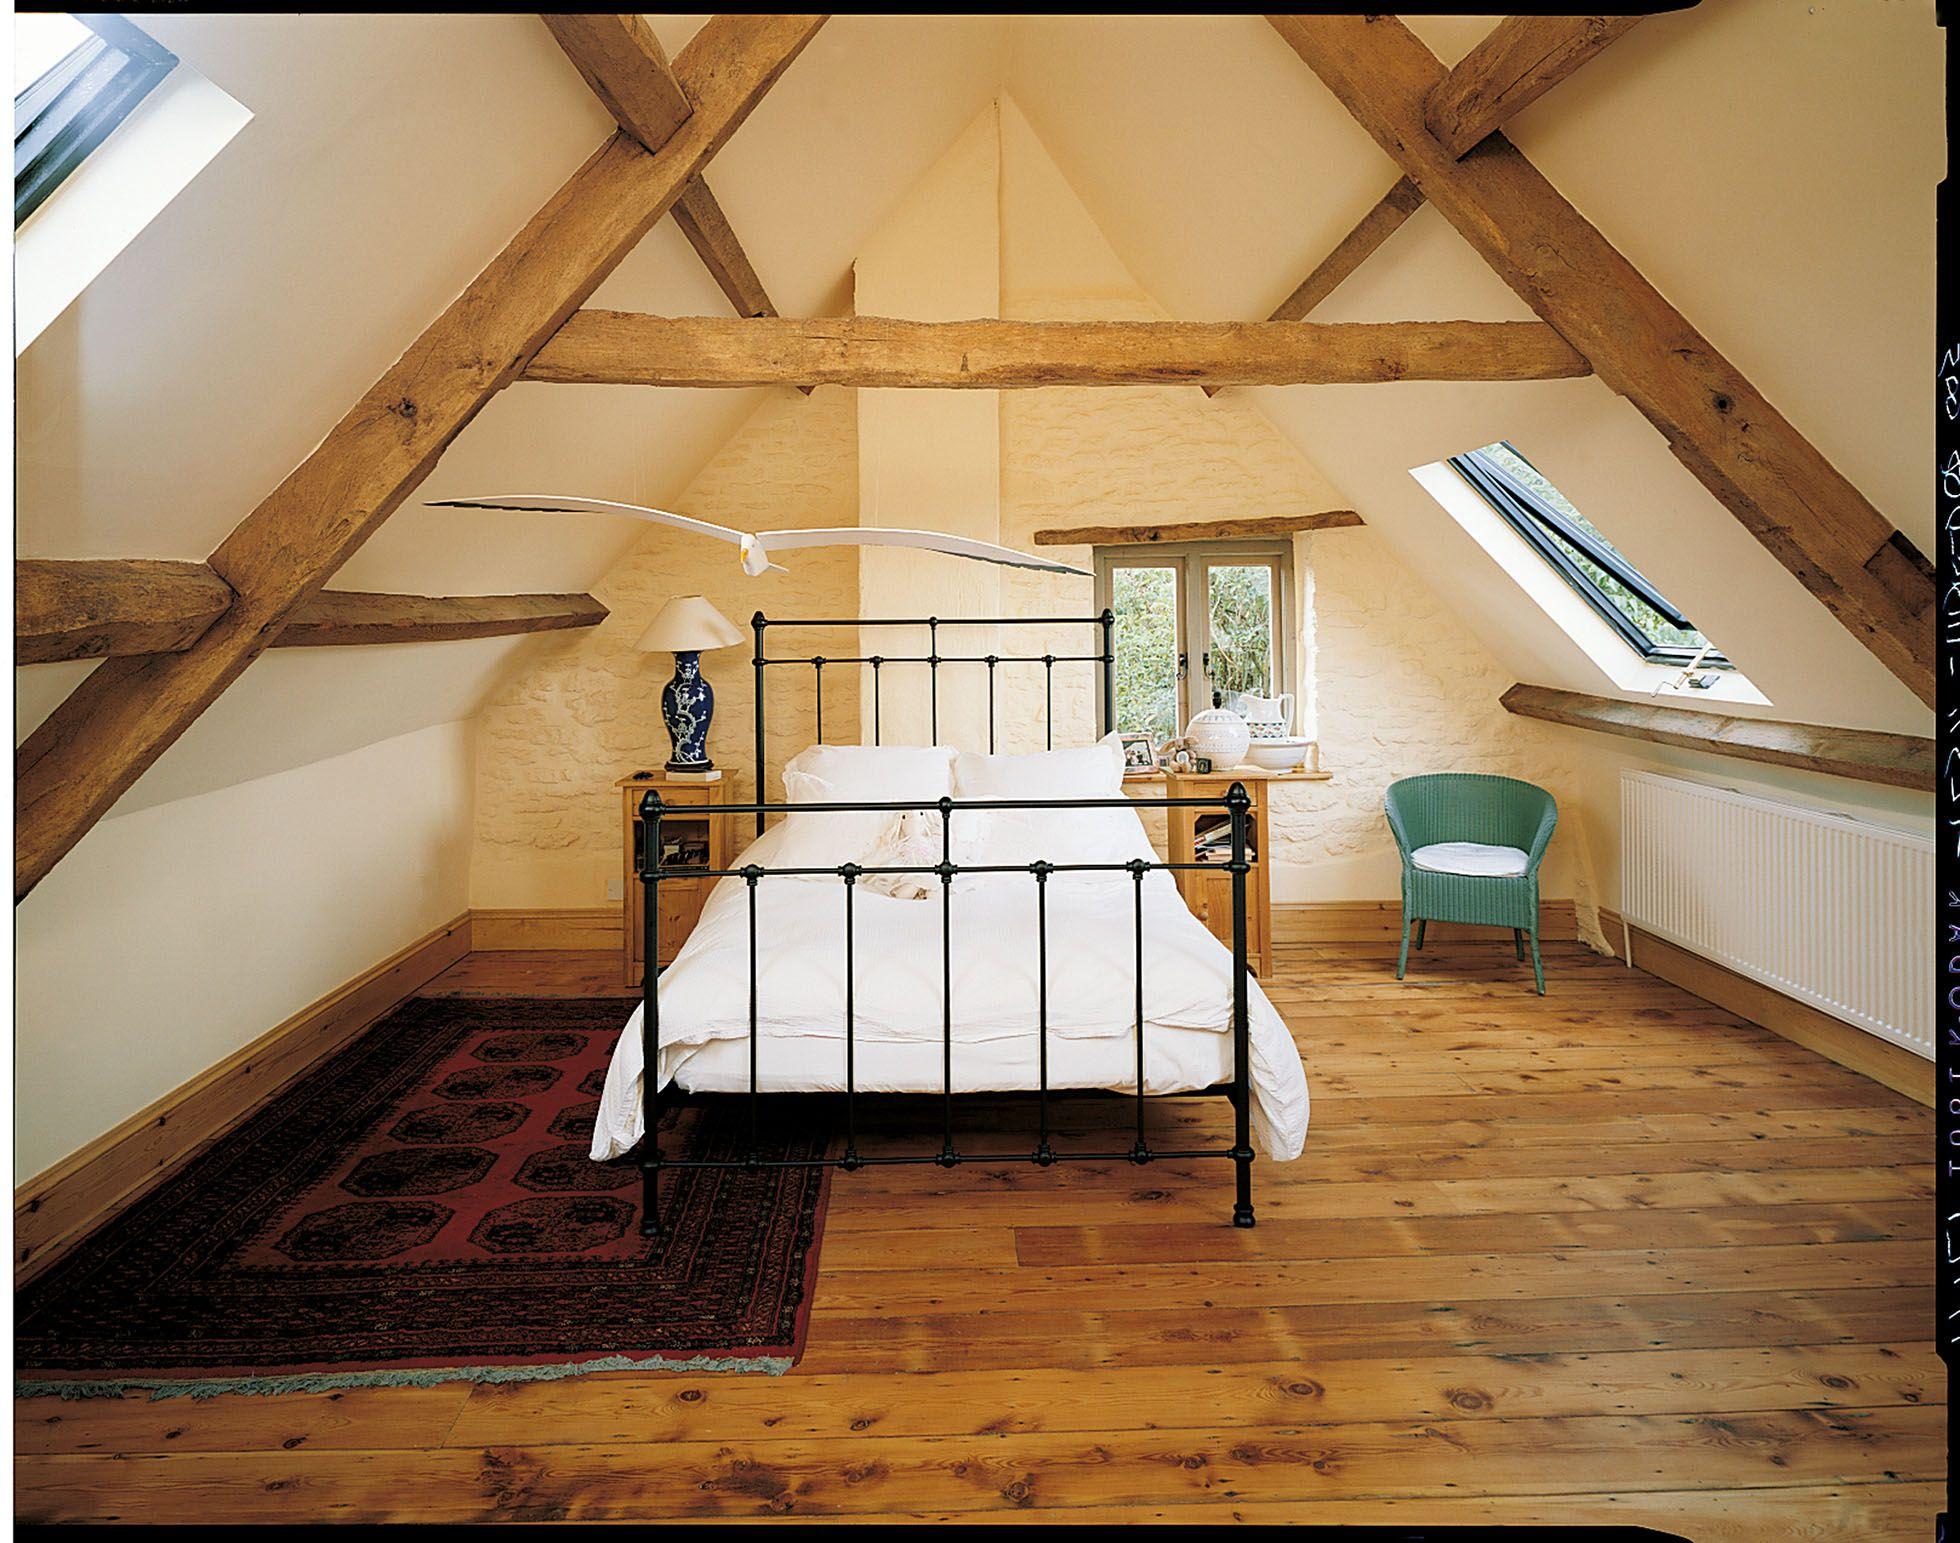 Loft Conversion Design Guide  Dormer Bedrooms  Pinterest  Lofts